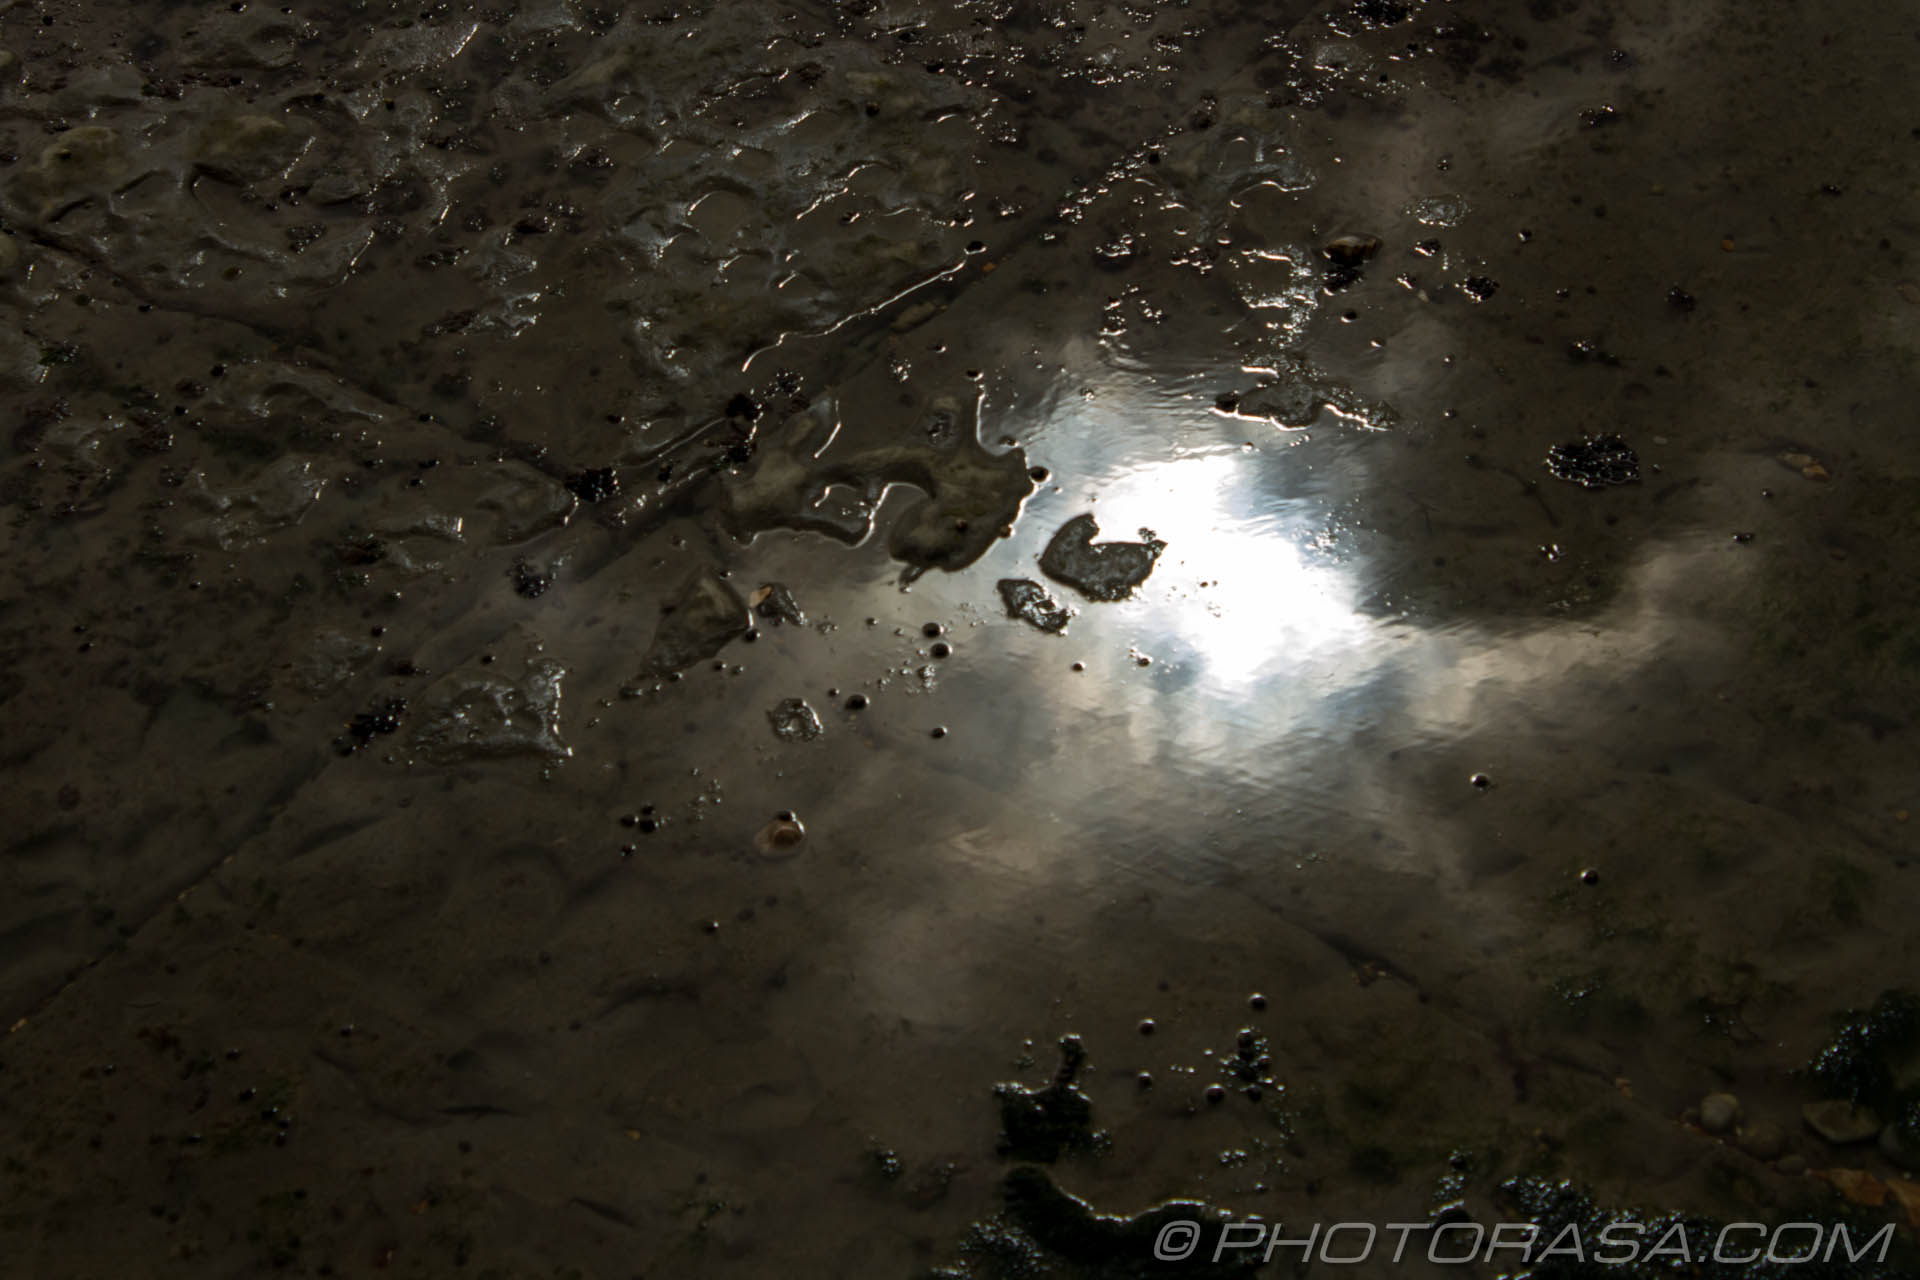 https://photorasa.com/jurassic-coast-lyme-regis/sky-reflection/